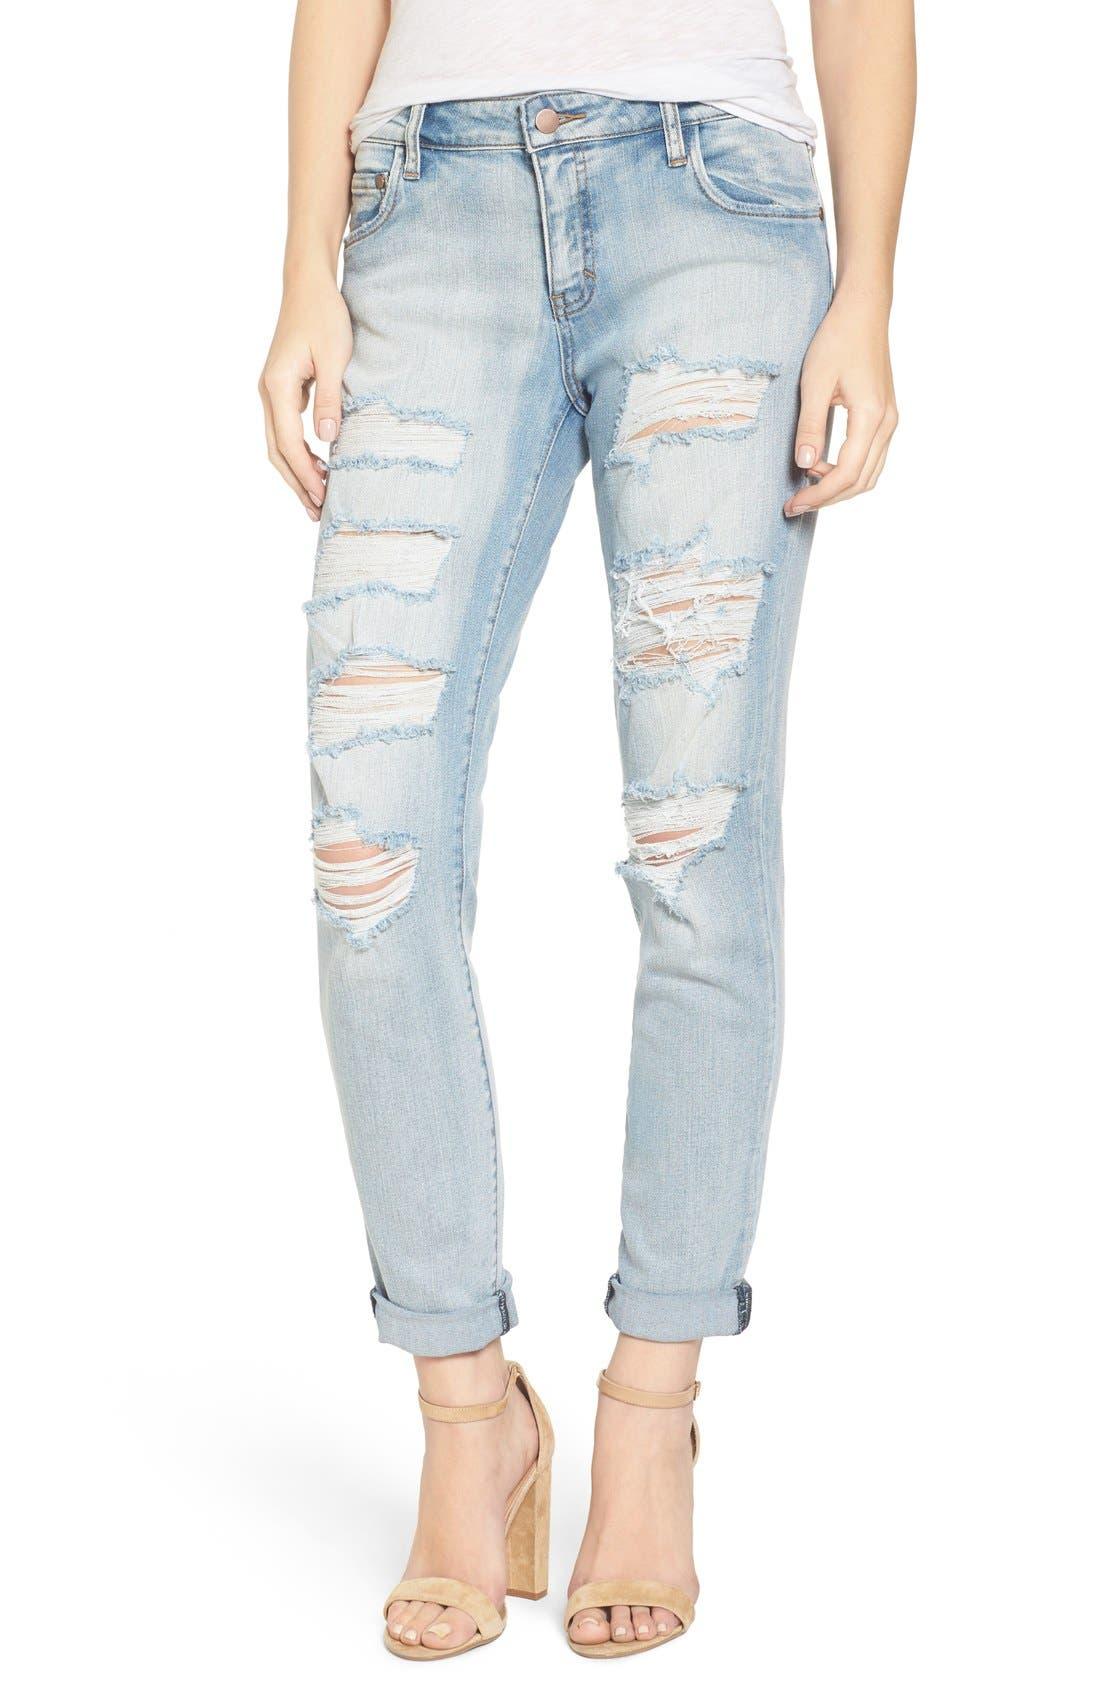 Alternate Image 1 Selected - BP. Ripped Skinny Boyfriend Jeans